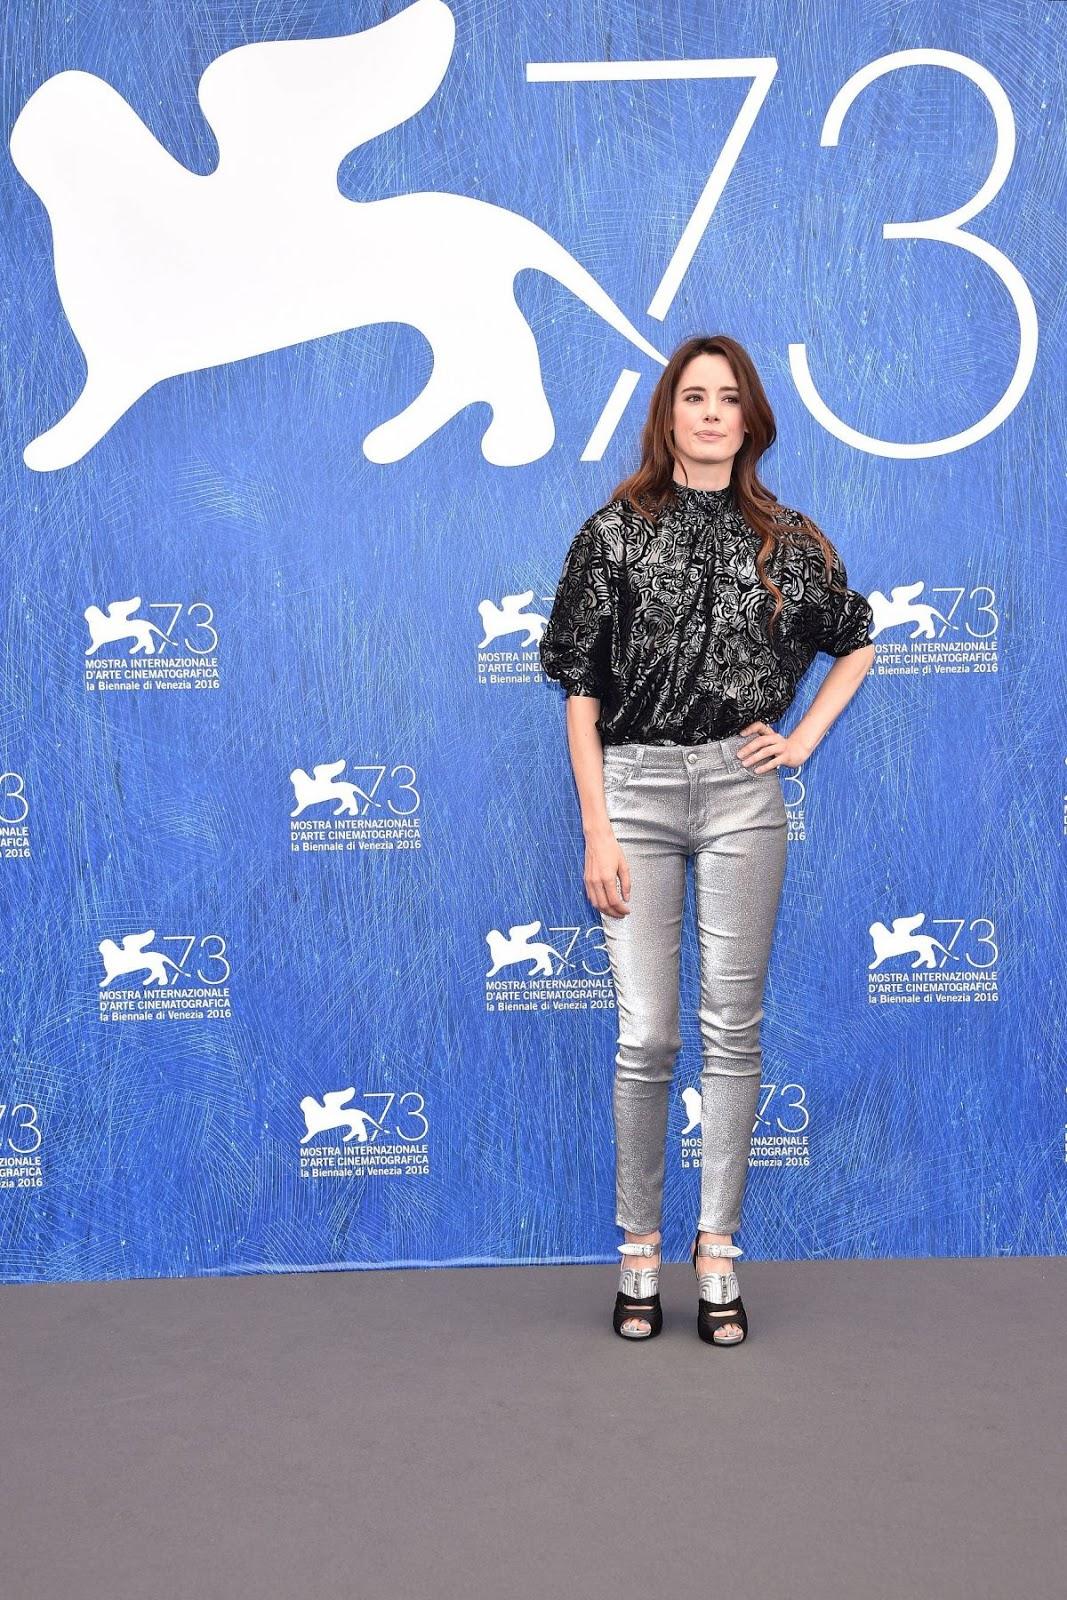 HQ Photos of Pilar Lopez De Ayala at 2016 73rd Venice Film Festival Jury Photocall in Venice